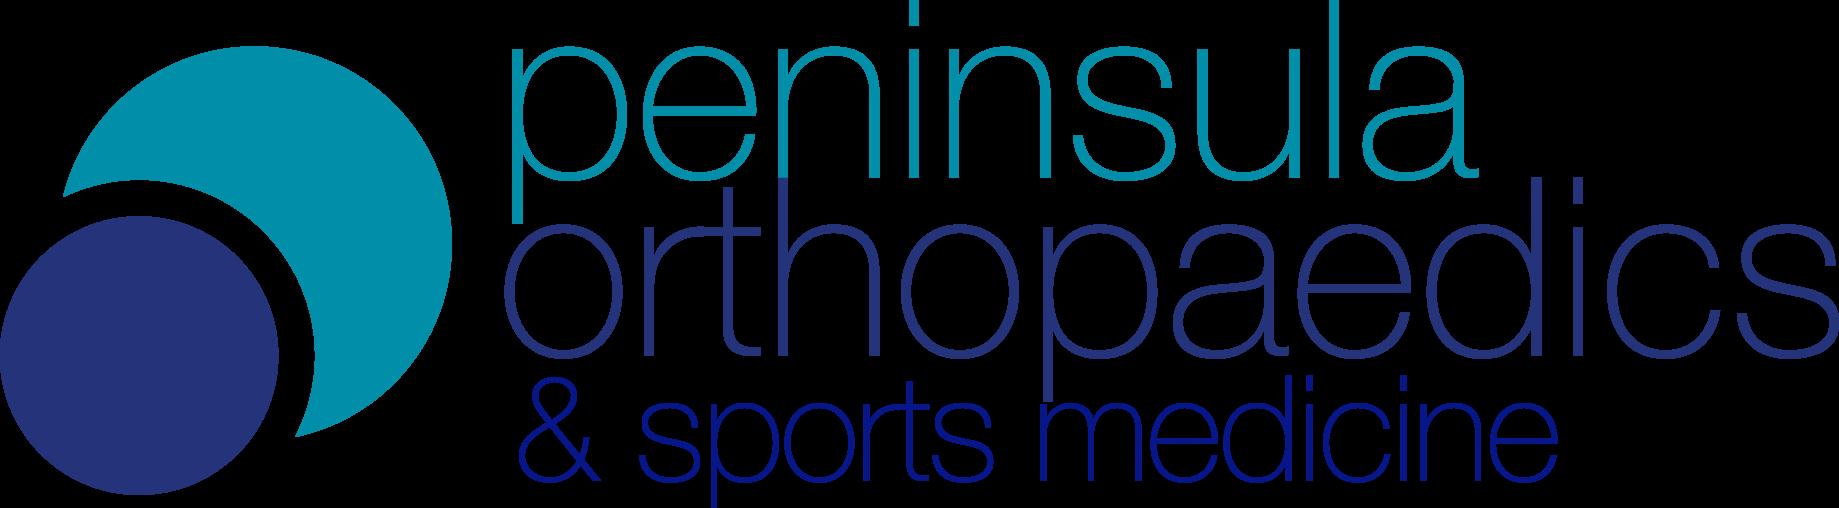 logo for Peninsula Orthopaedics & Sports Medicine - Dr David Carmody Orthopaedic Surgeons